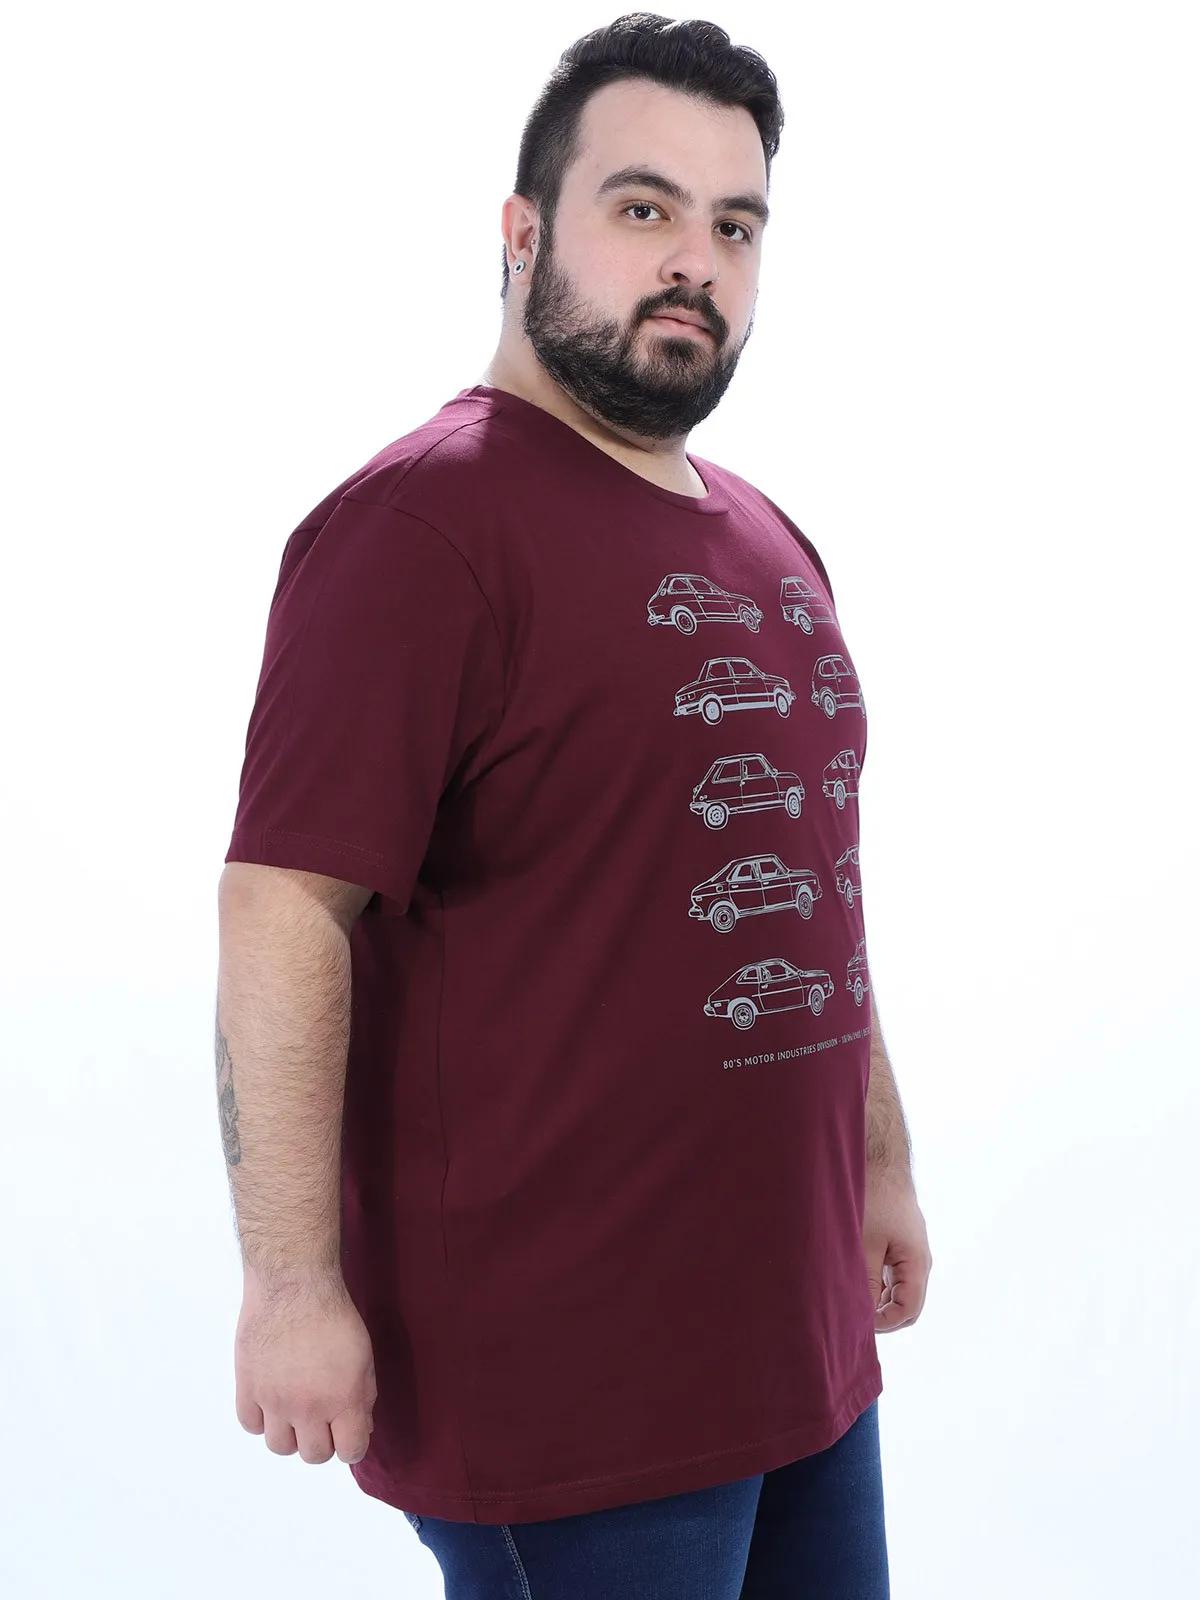 Camiseta Plus Size Masculino Manga Curta Estampada Vinho